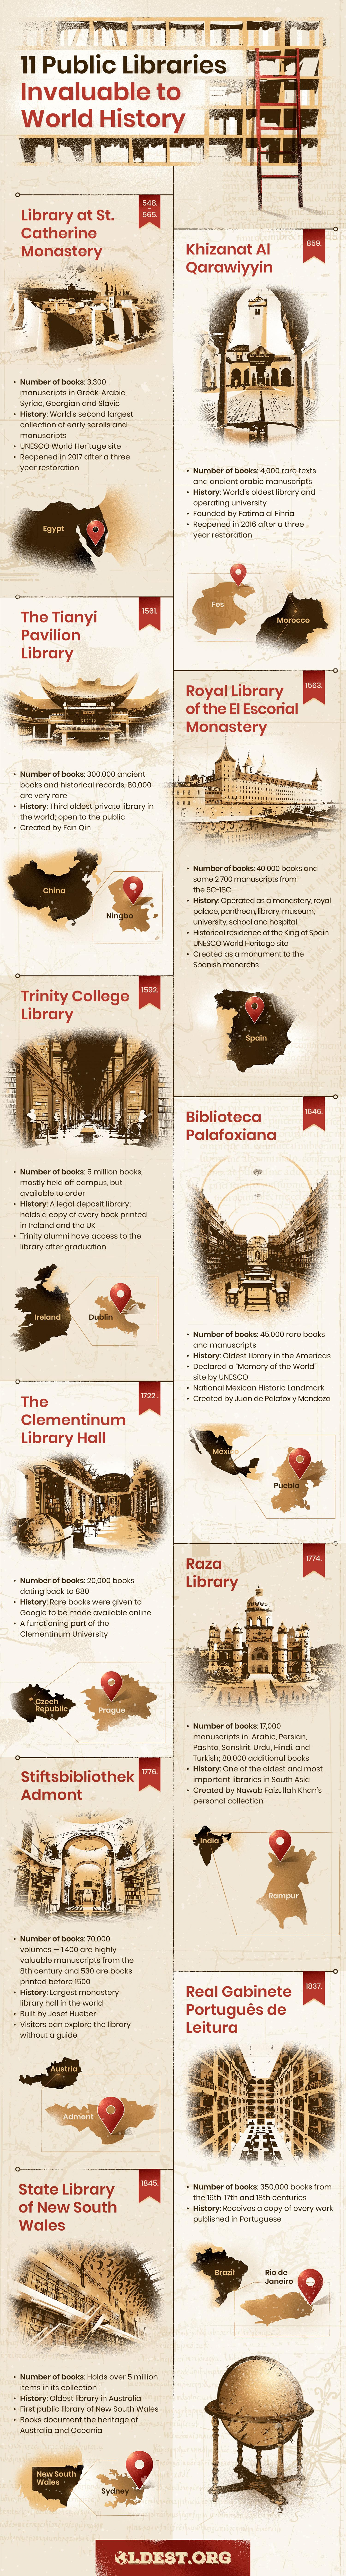 historic libraries